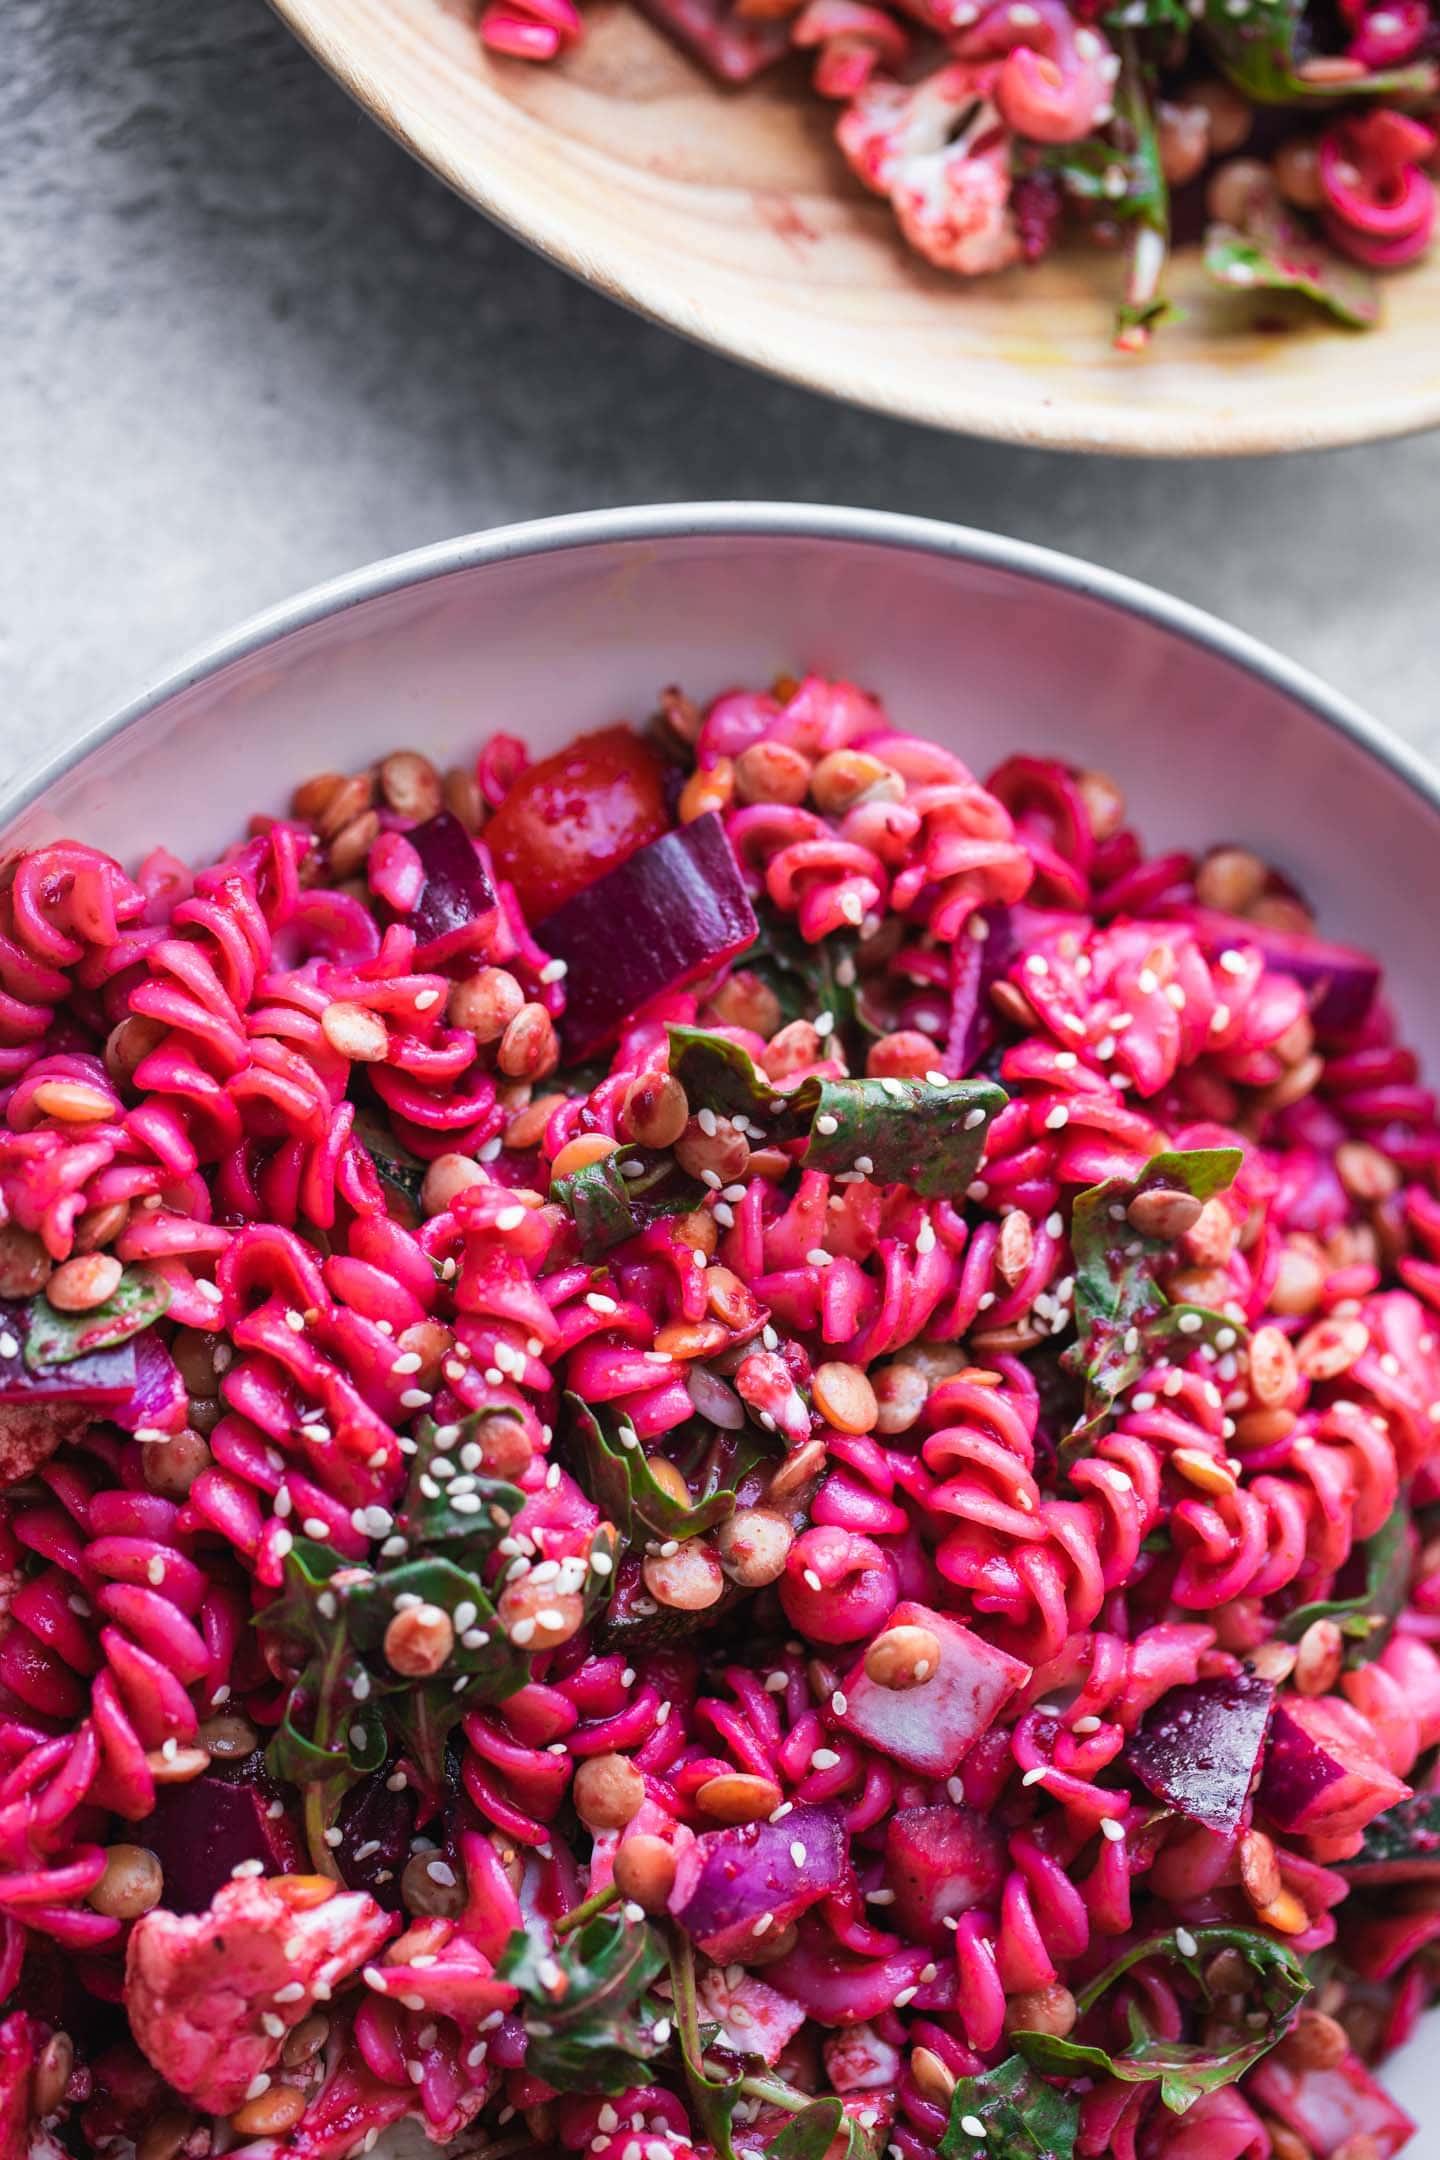 Bowl of vegan pasta salad with green lentils